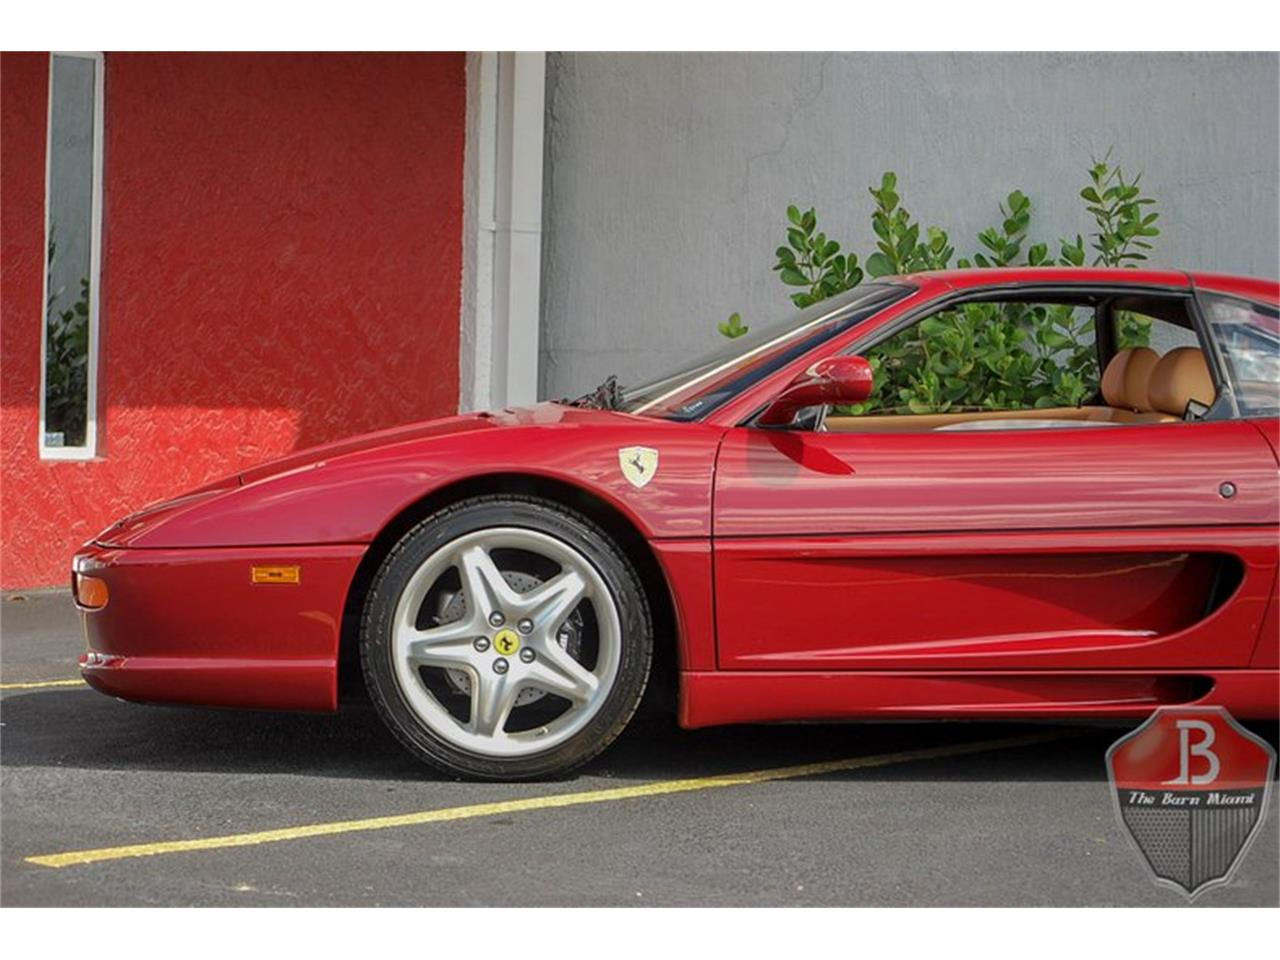 Large Picture of '99 Ferrari F355 located in Miami Florida - $89,900.00 - N6Y8